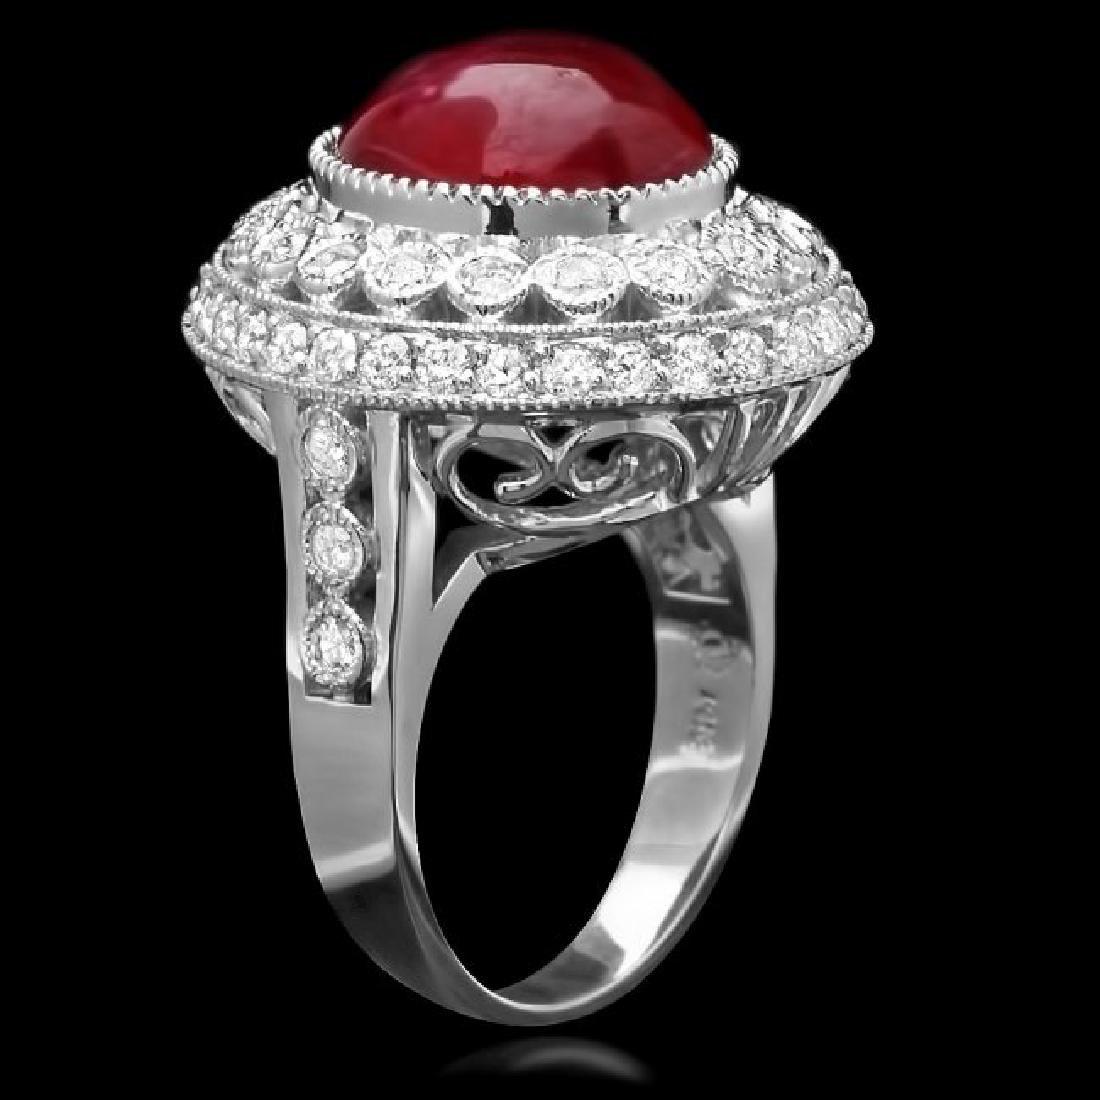 14k White Gold 10.00ct Ruby 1.25ct Diamond Ring - 2